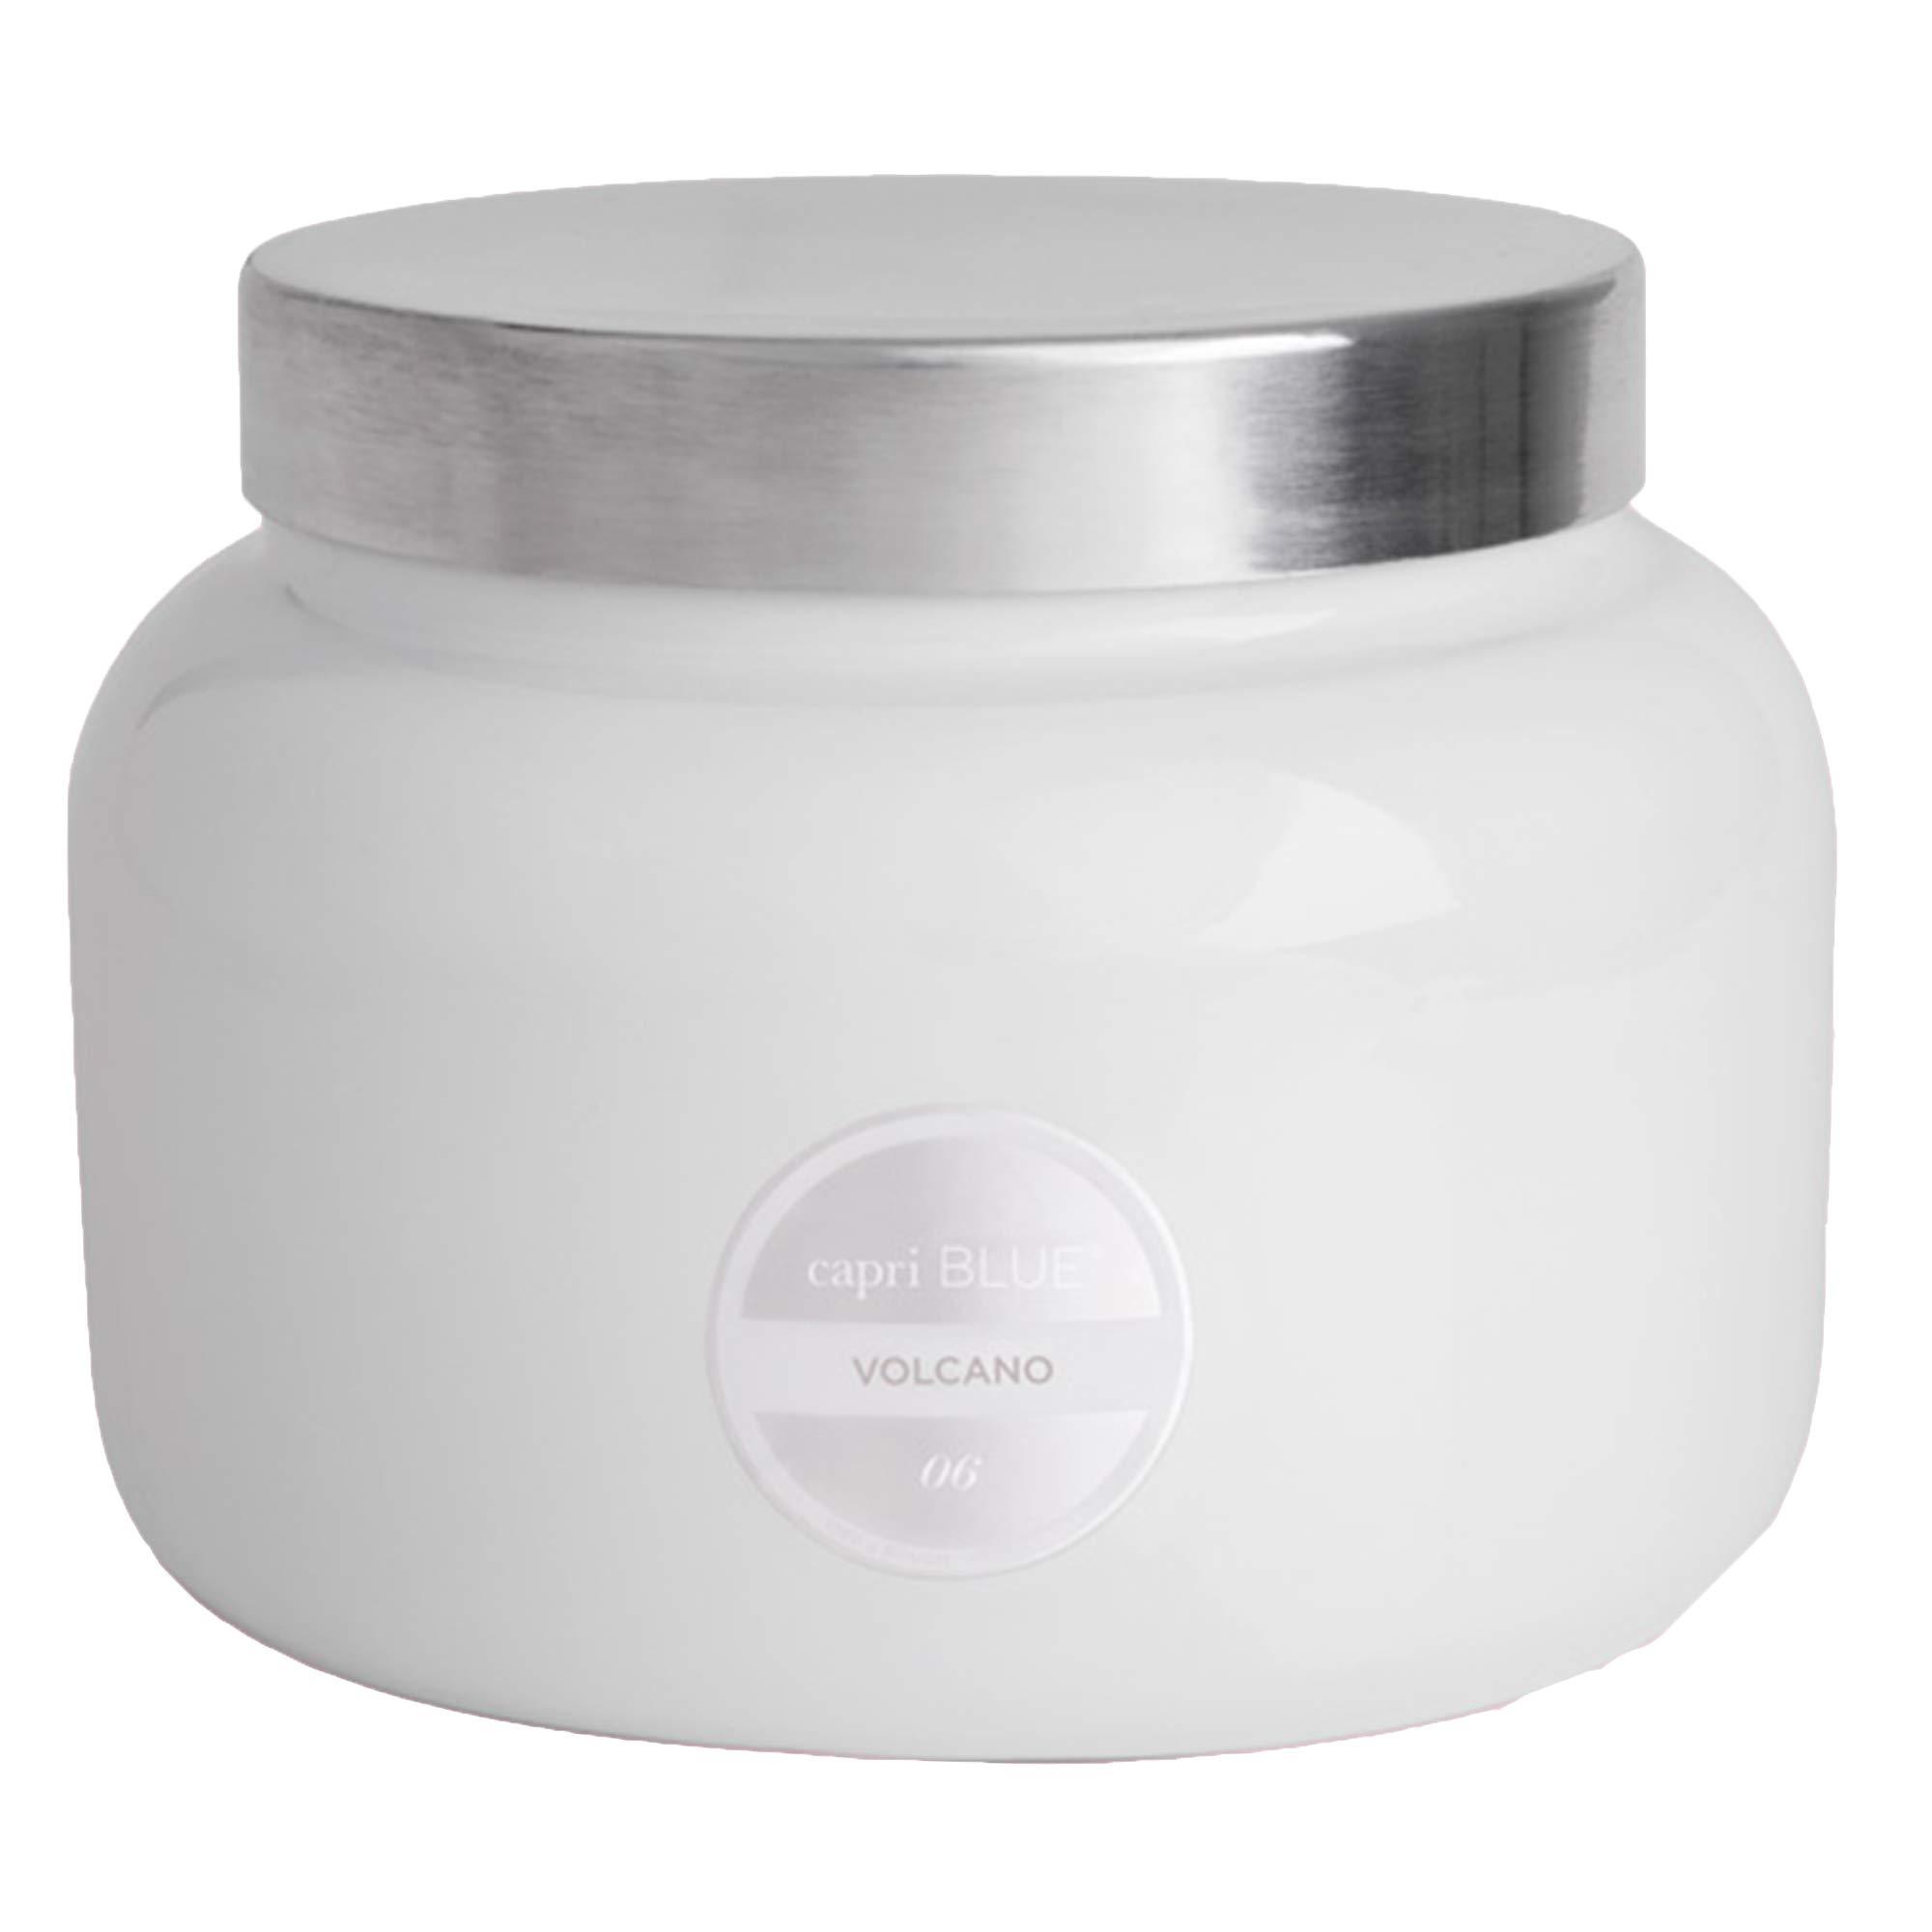 Capri Blue 48 oz Volcano White Jumbo Jar Candle